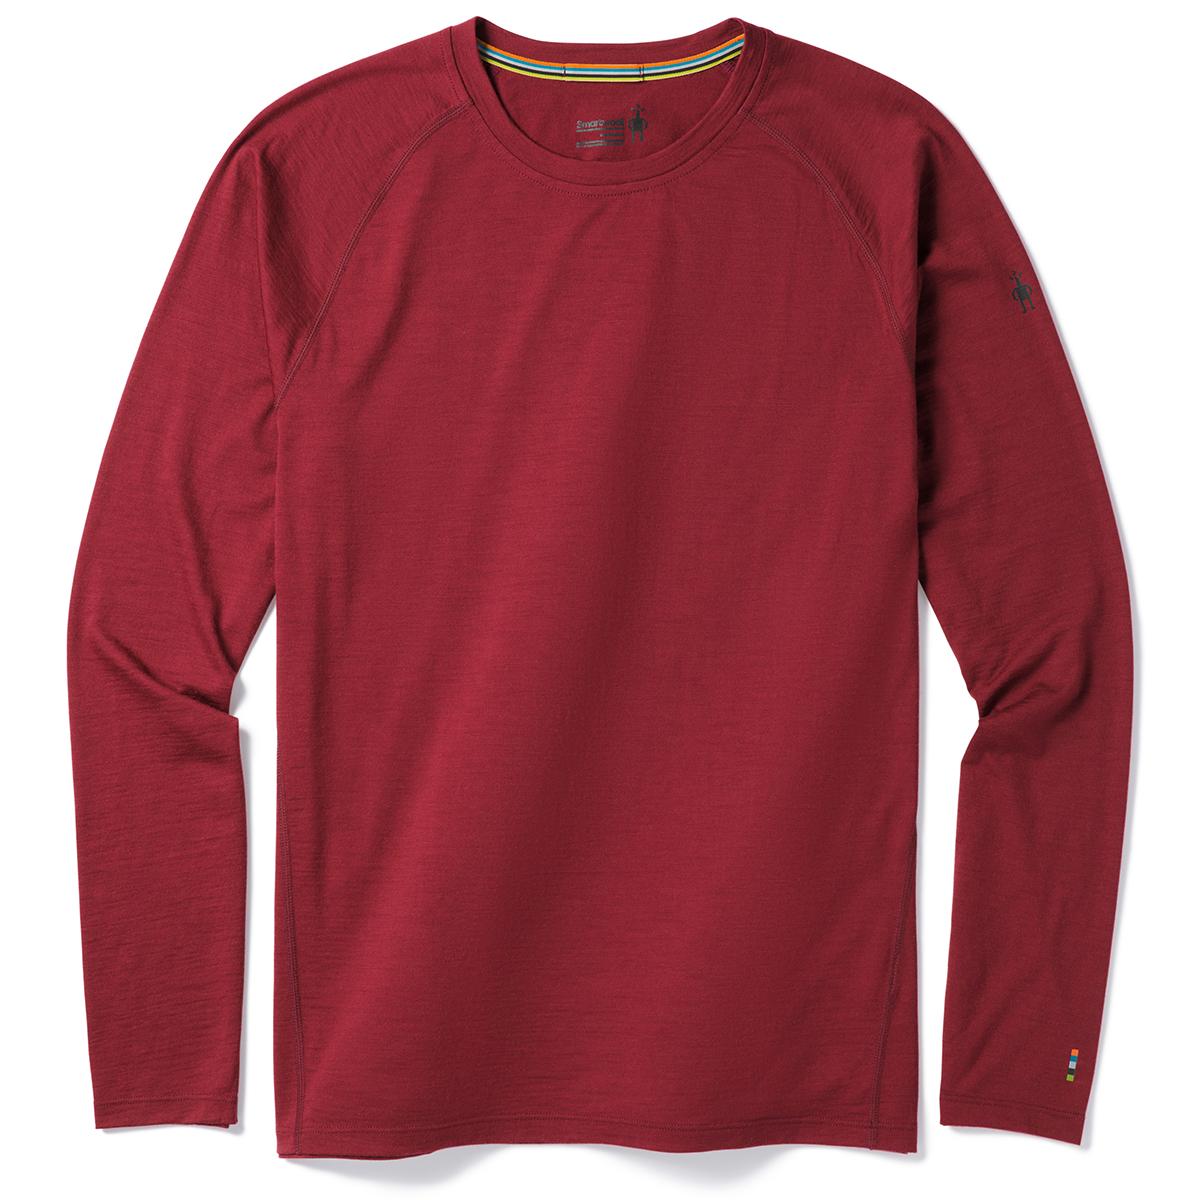 Smartwool Men's Merino 150 Long-Sleeve Baselayer Top - Red, M